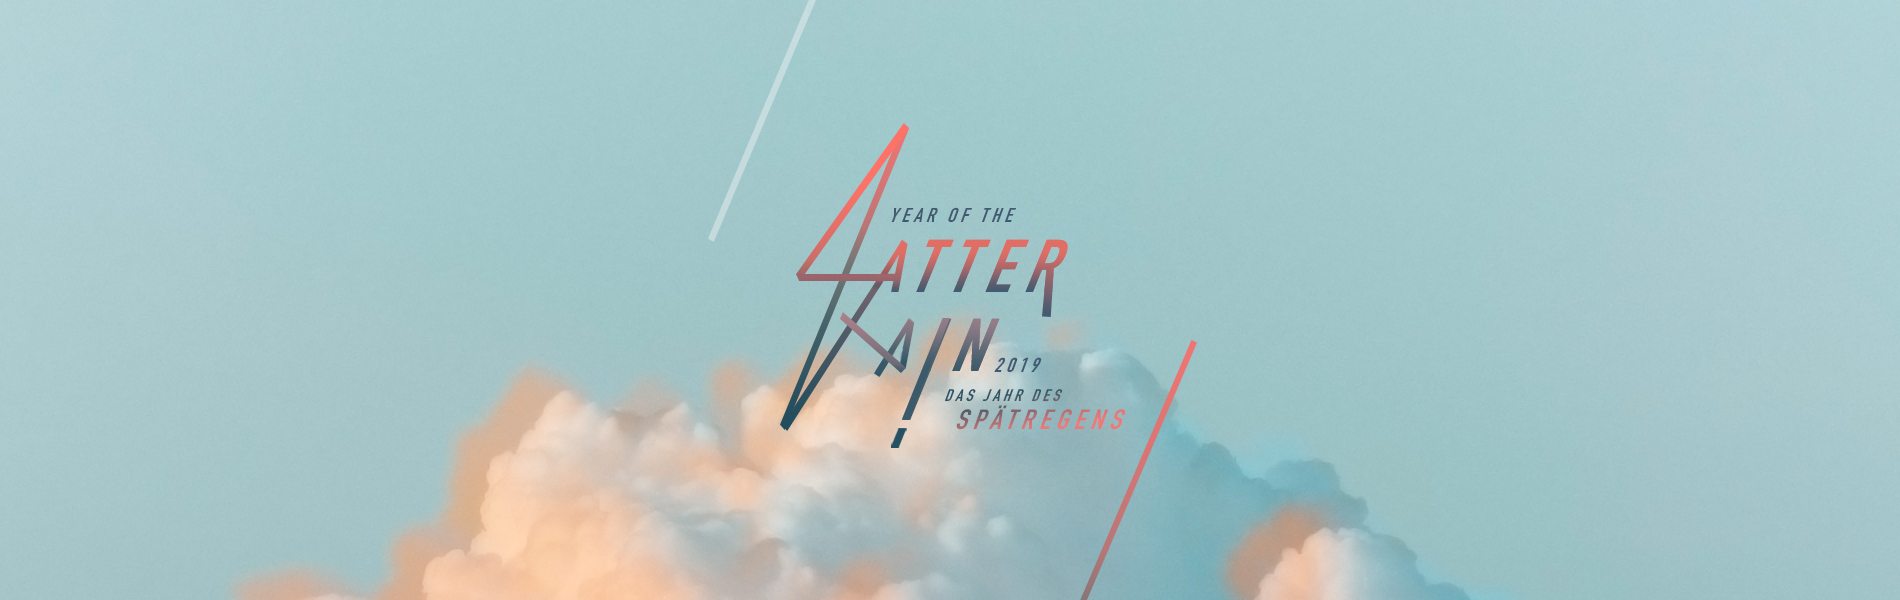 2019_02_Feb_Year_of_the_Latter_Rain_DE Home   New Creation TV